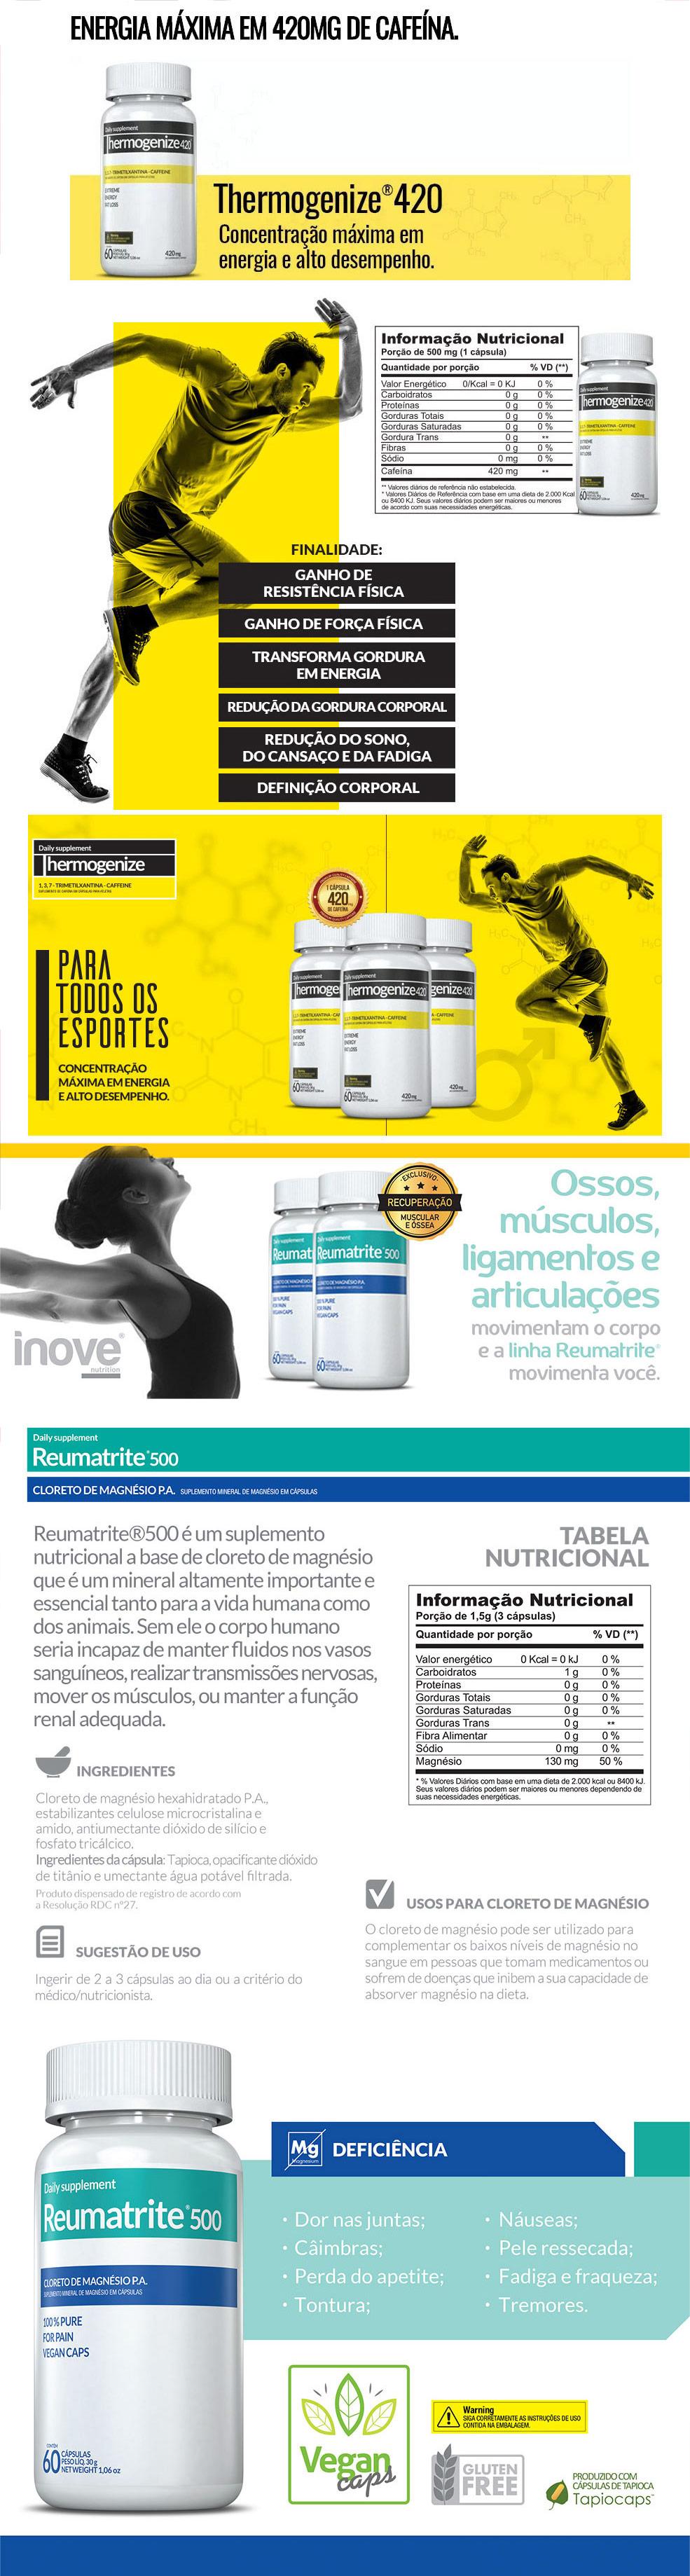 Thermogenize® 420 + Reumatrite® 500 + Squeeze Inove Nutrition